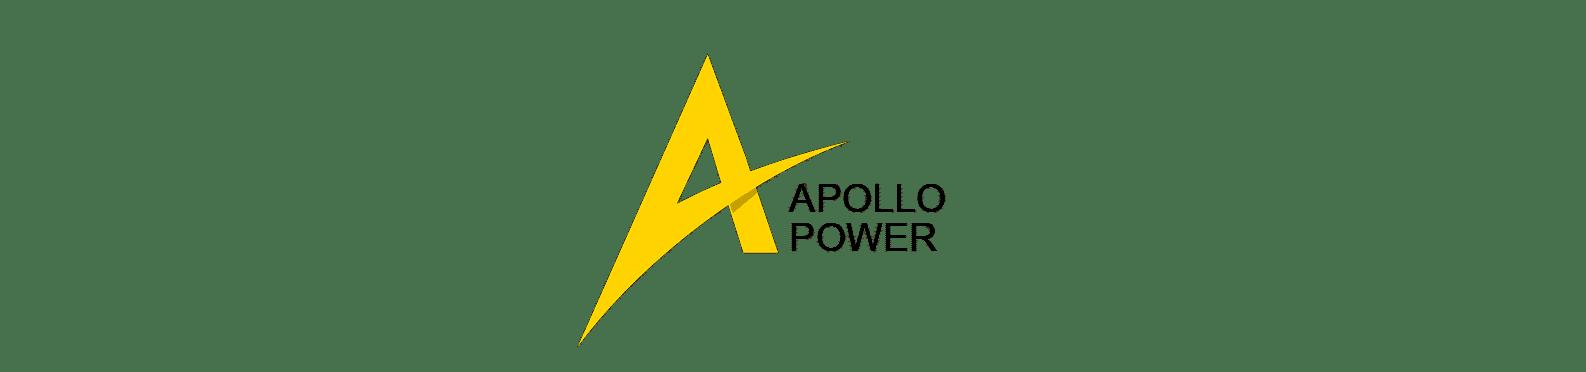 Apollo Power